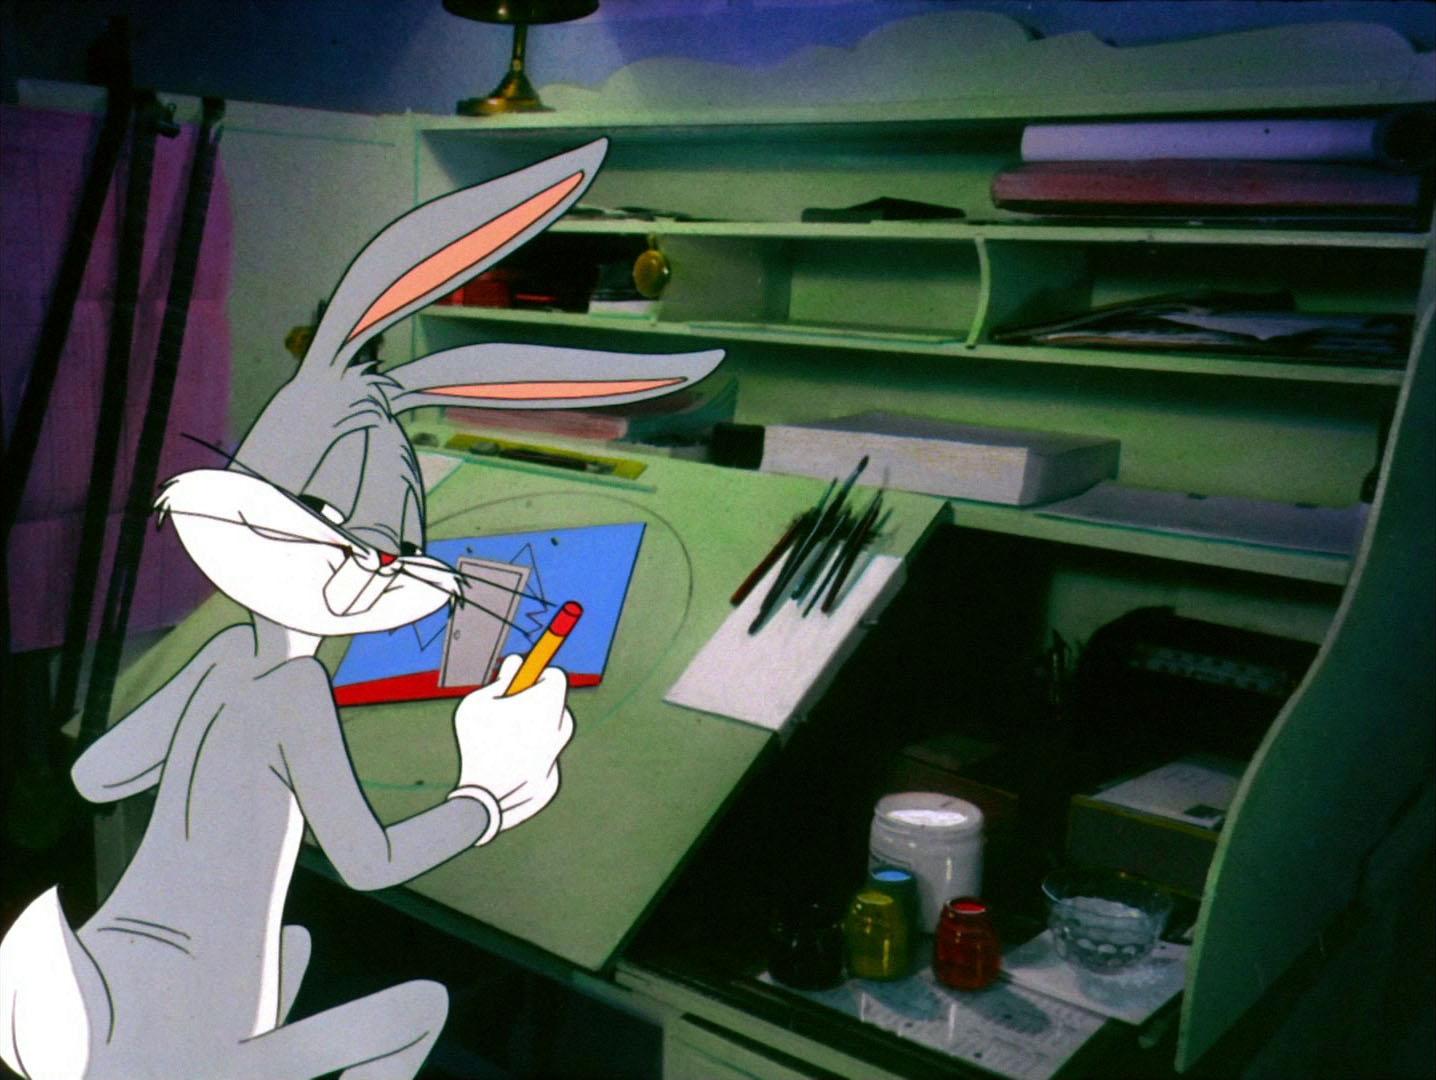 Anime Devil Girl Wallpaper Looney Tunes Pictures Quot Duck Amuck Quot